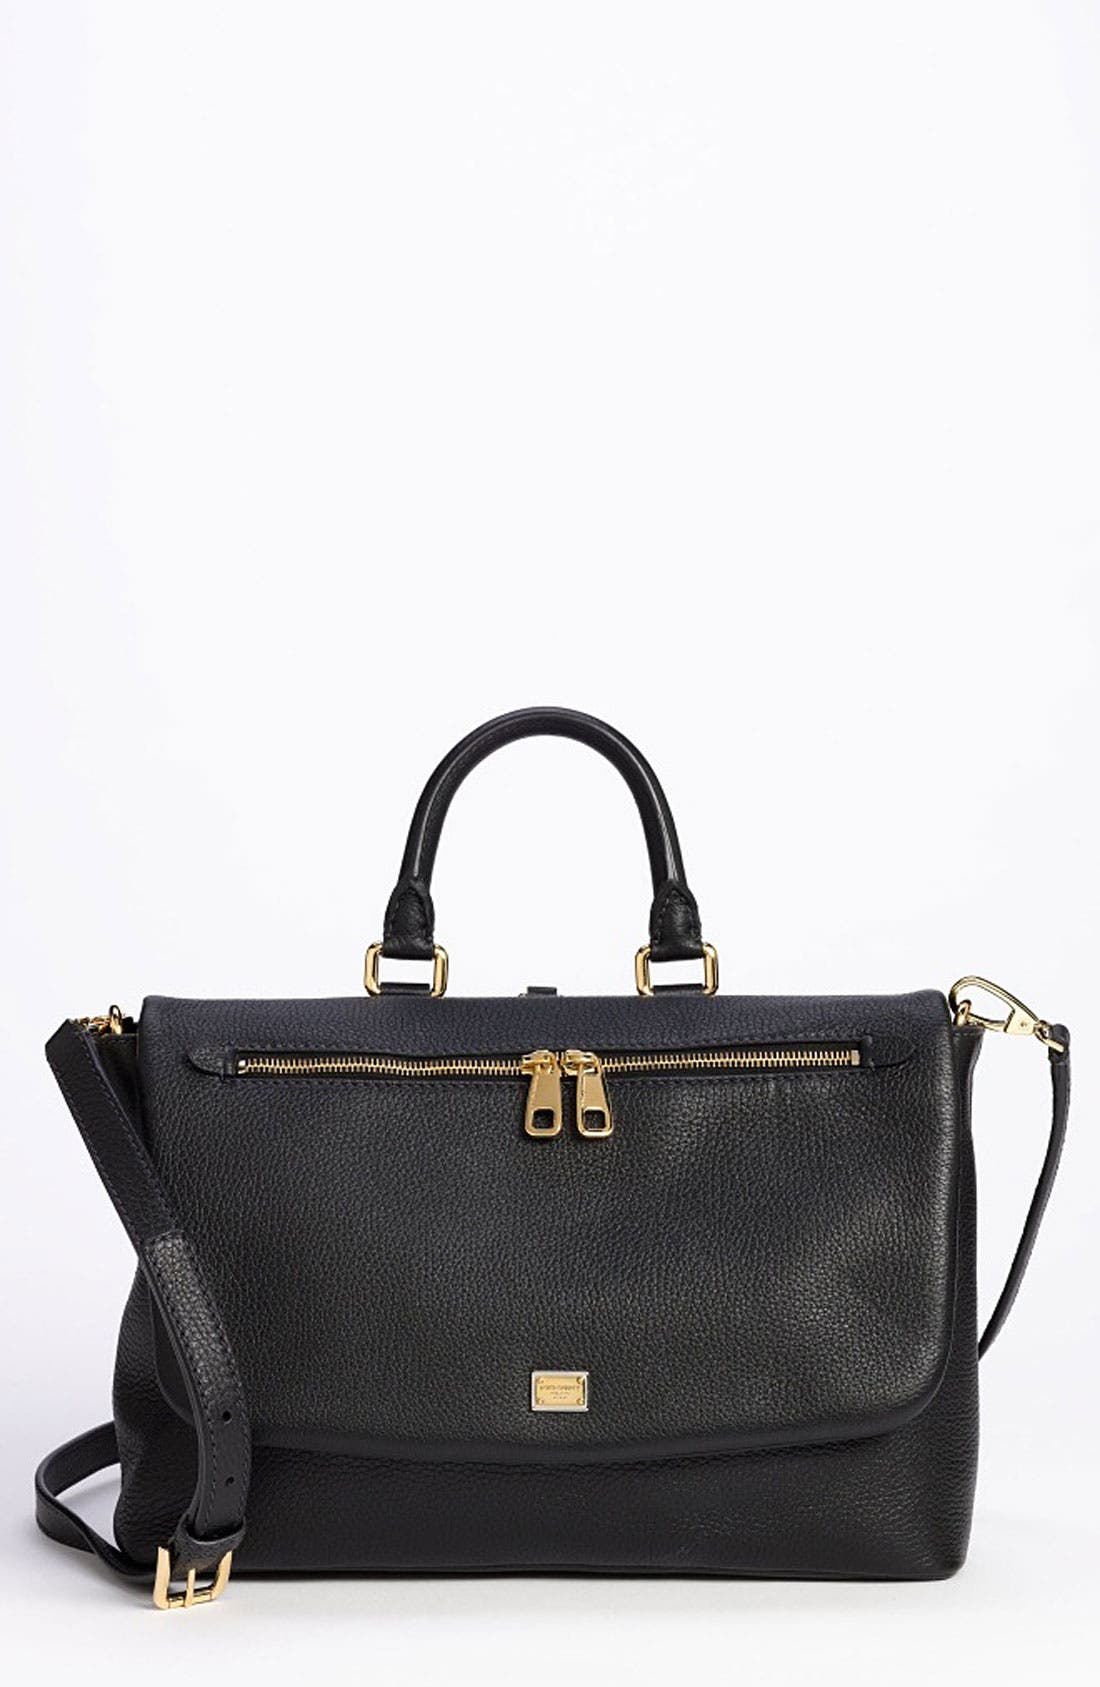 Alternate Image 1 Selected - Dolce&Gabbana 'Miss Emma' Leather Satchel